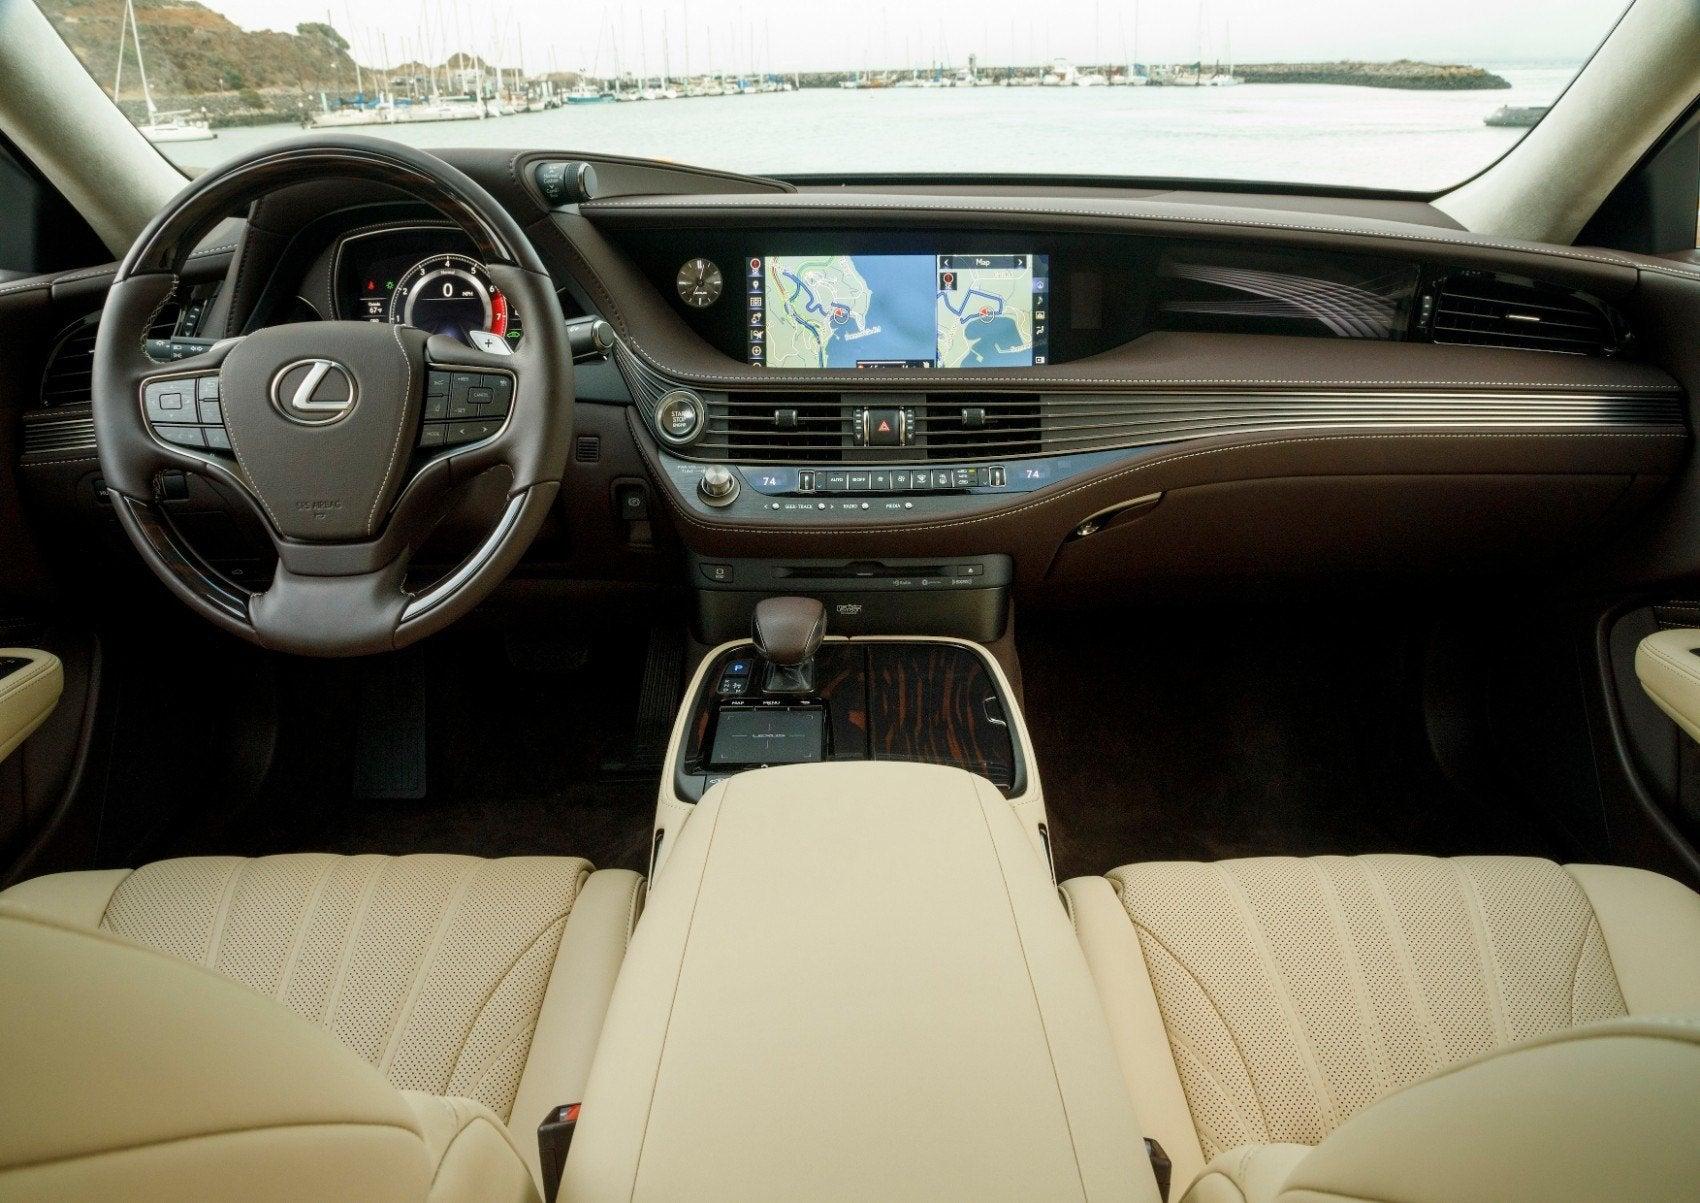 2020 Lexus LS 500 interior layout.